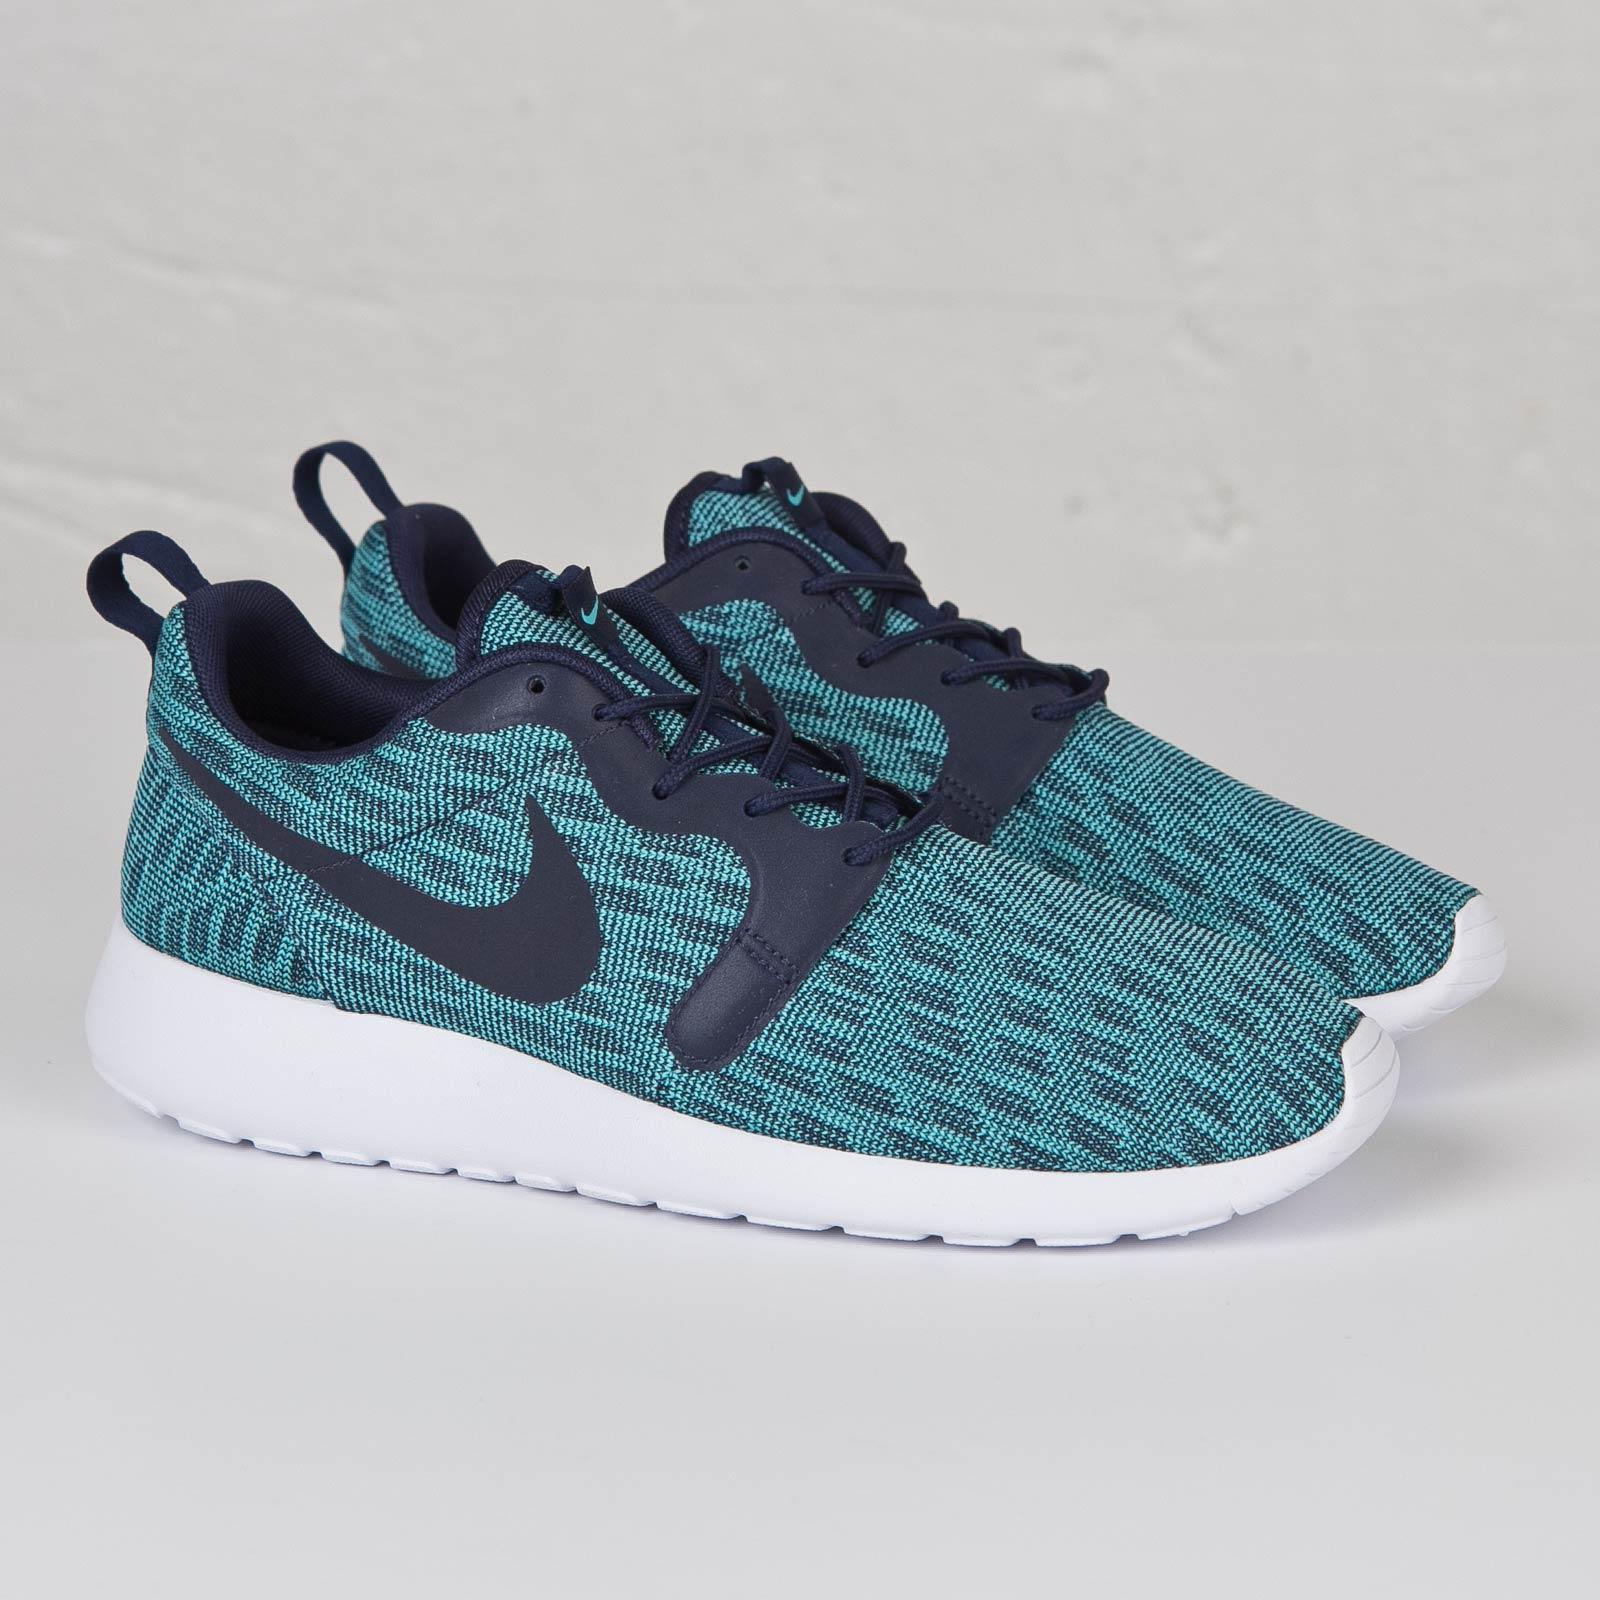 5da84d3a79eb Nike Roshe One Knit Jacquard - 777429-400 - Sneakersnstuff ...